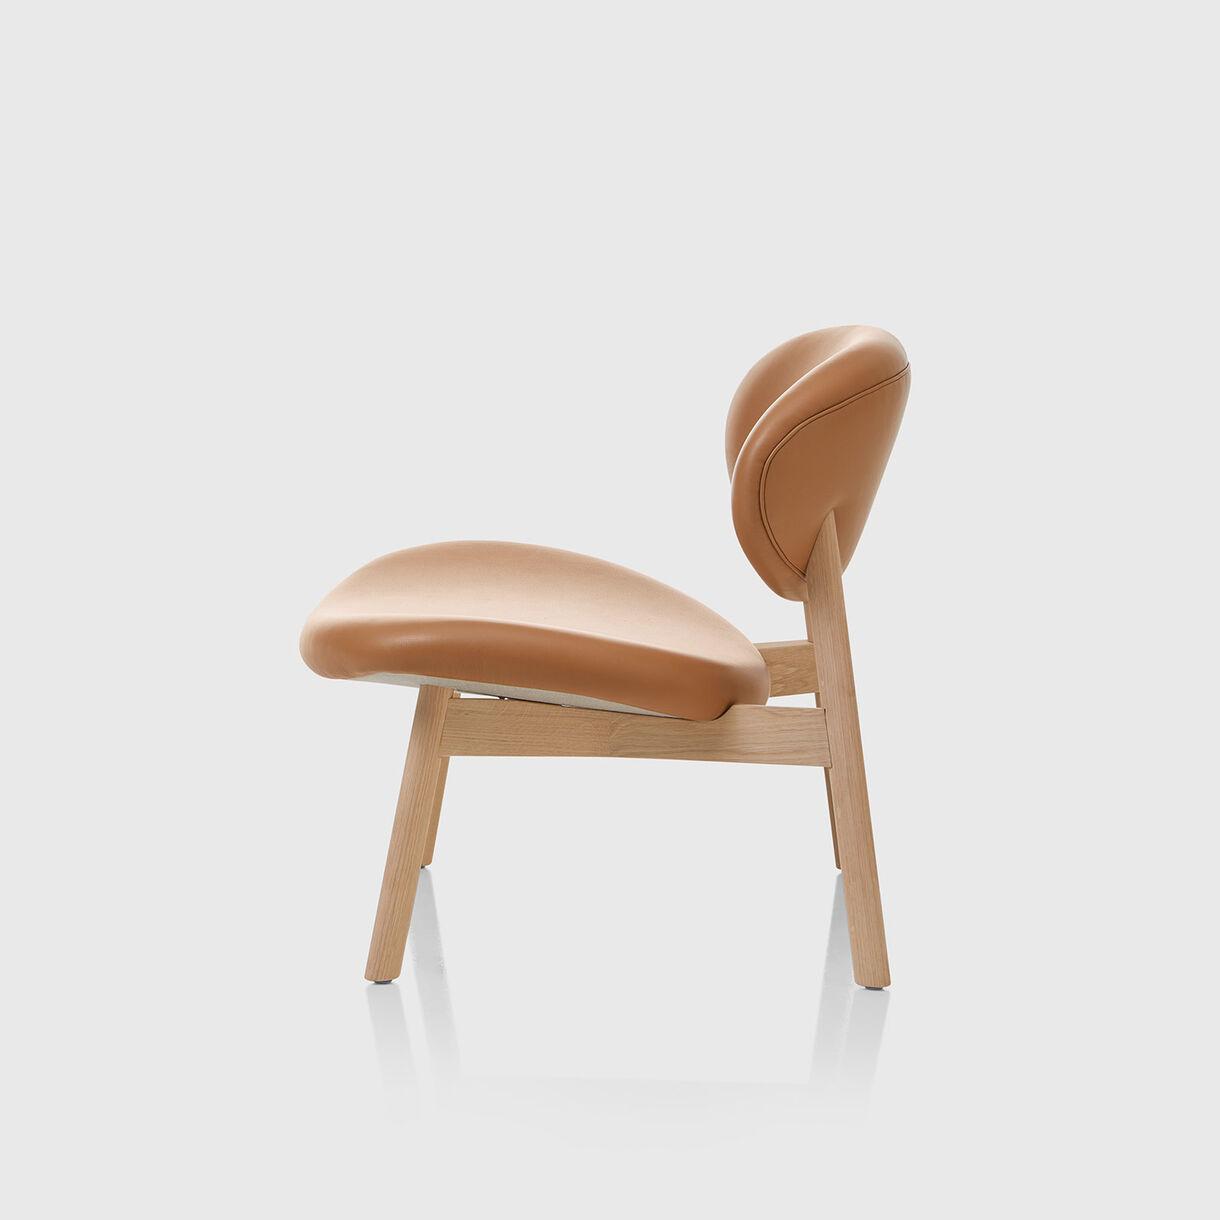 Ovoid Lounge Chair